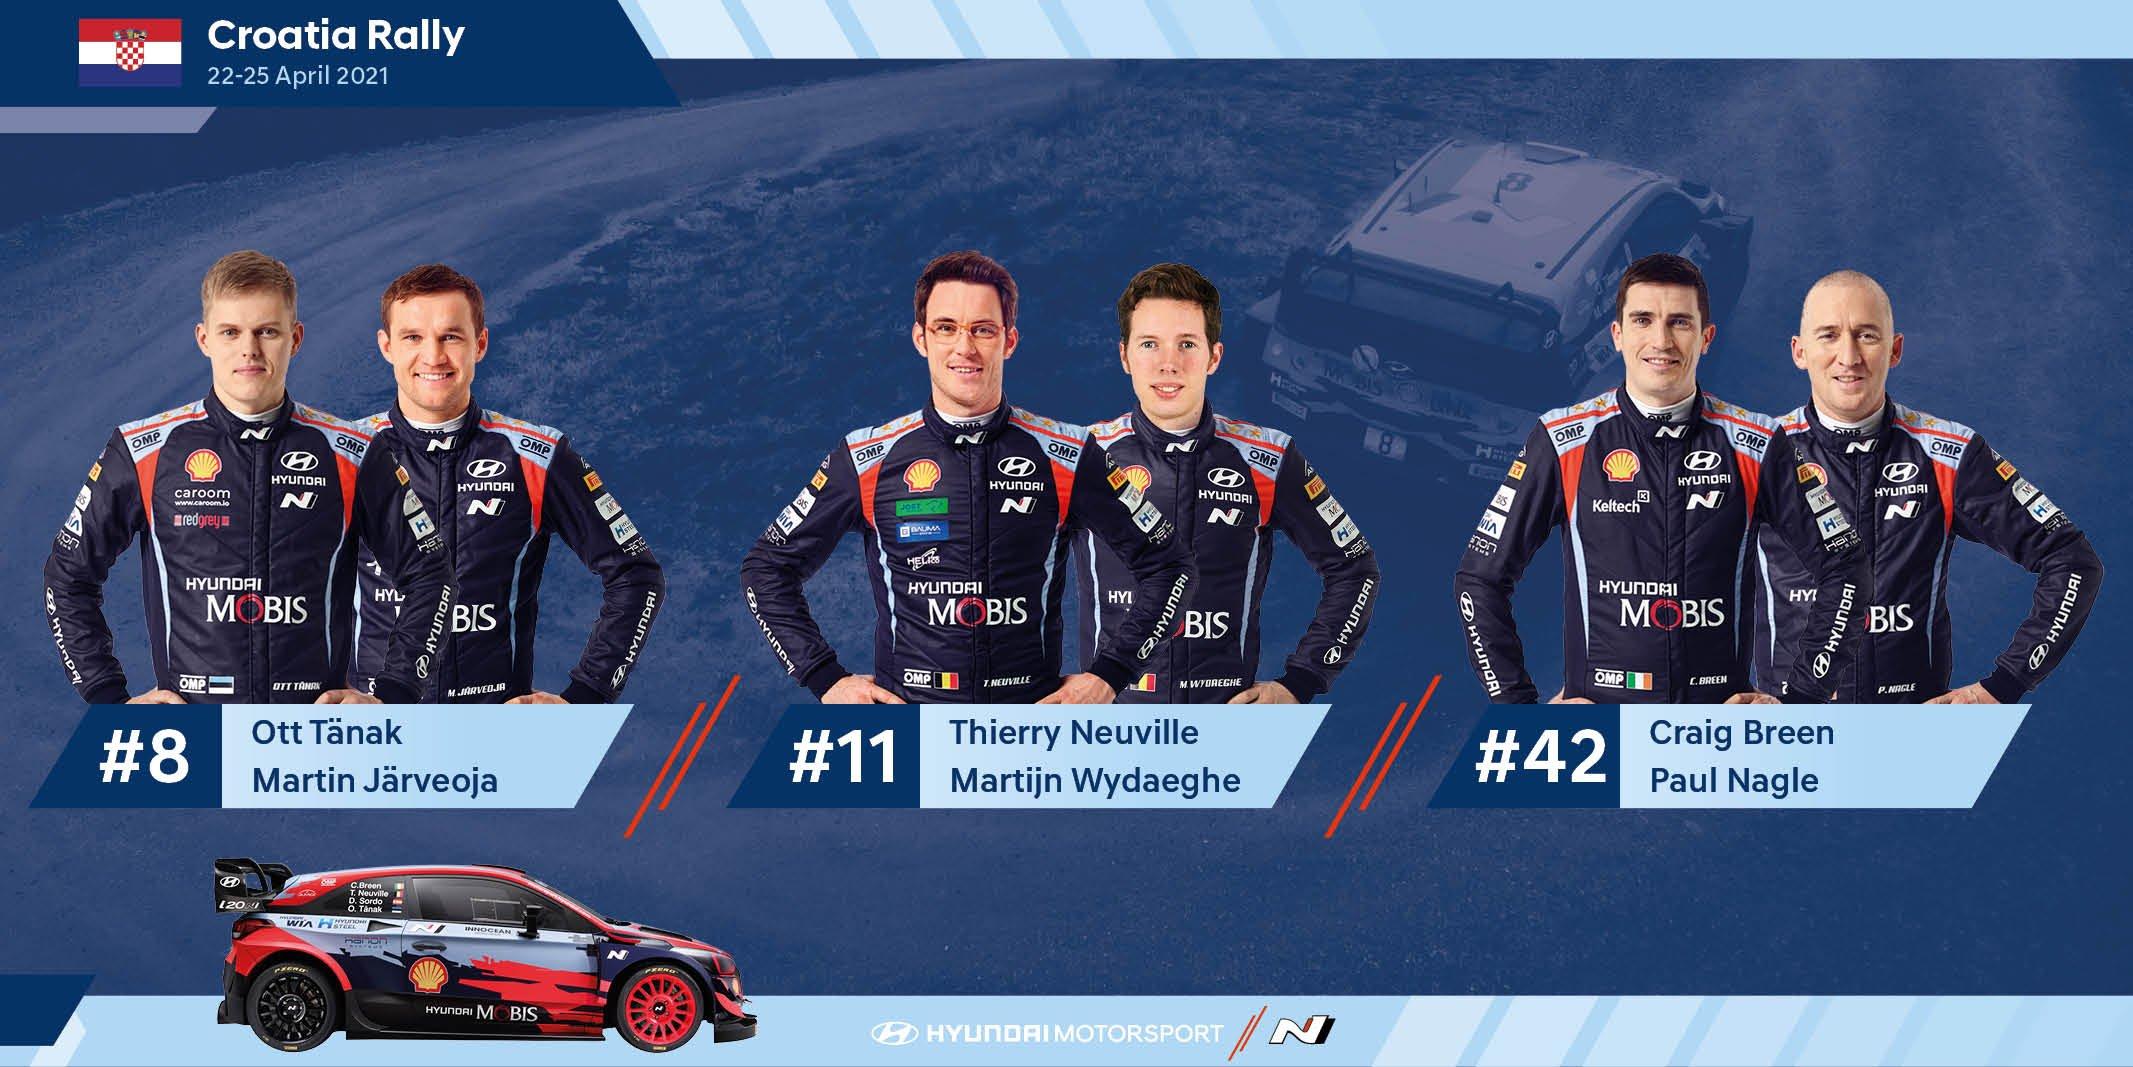 World Rally Championship: Temporada 2021  - Página 18 ExJ43avWYAQ0kyc?format=jpg&name=4096x4096